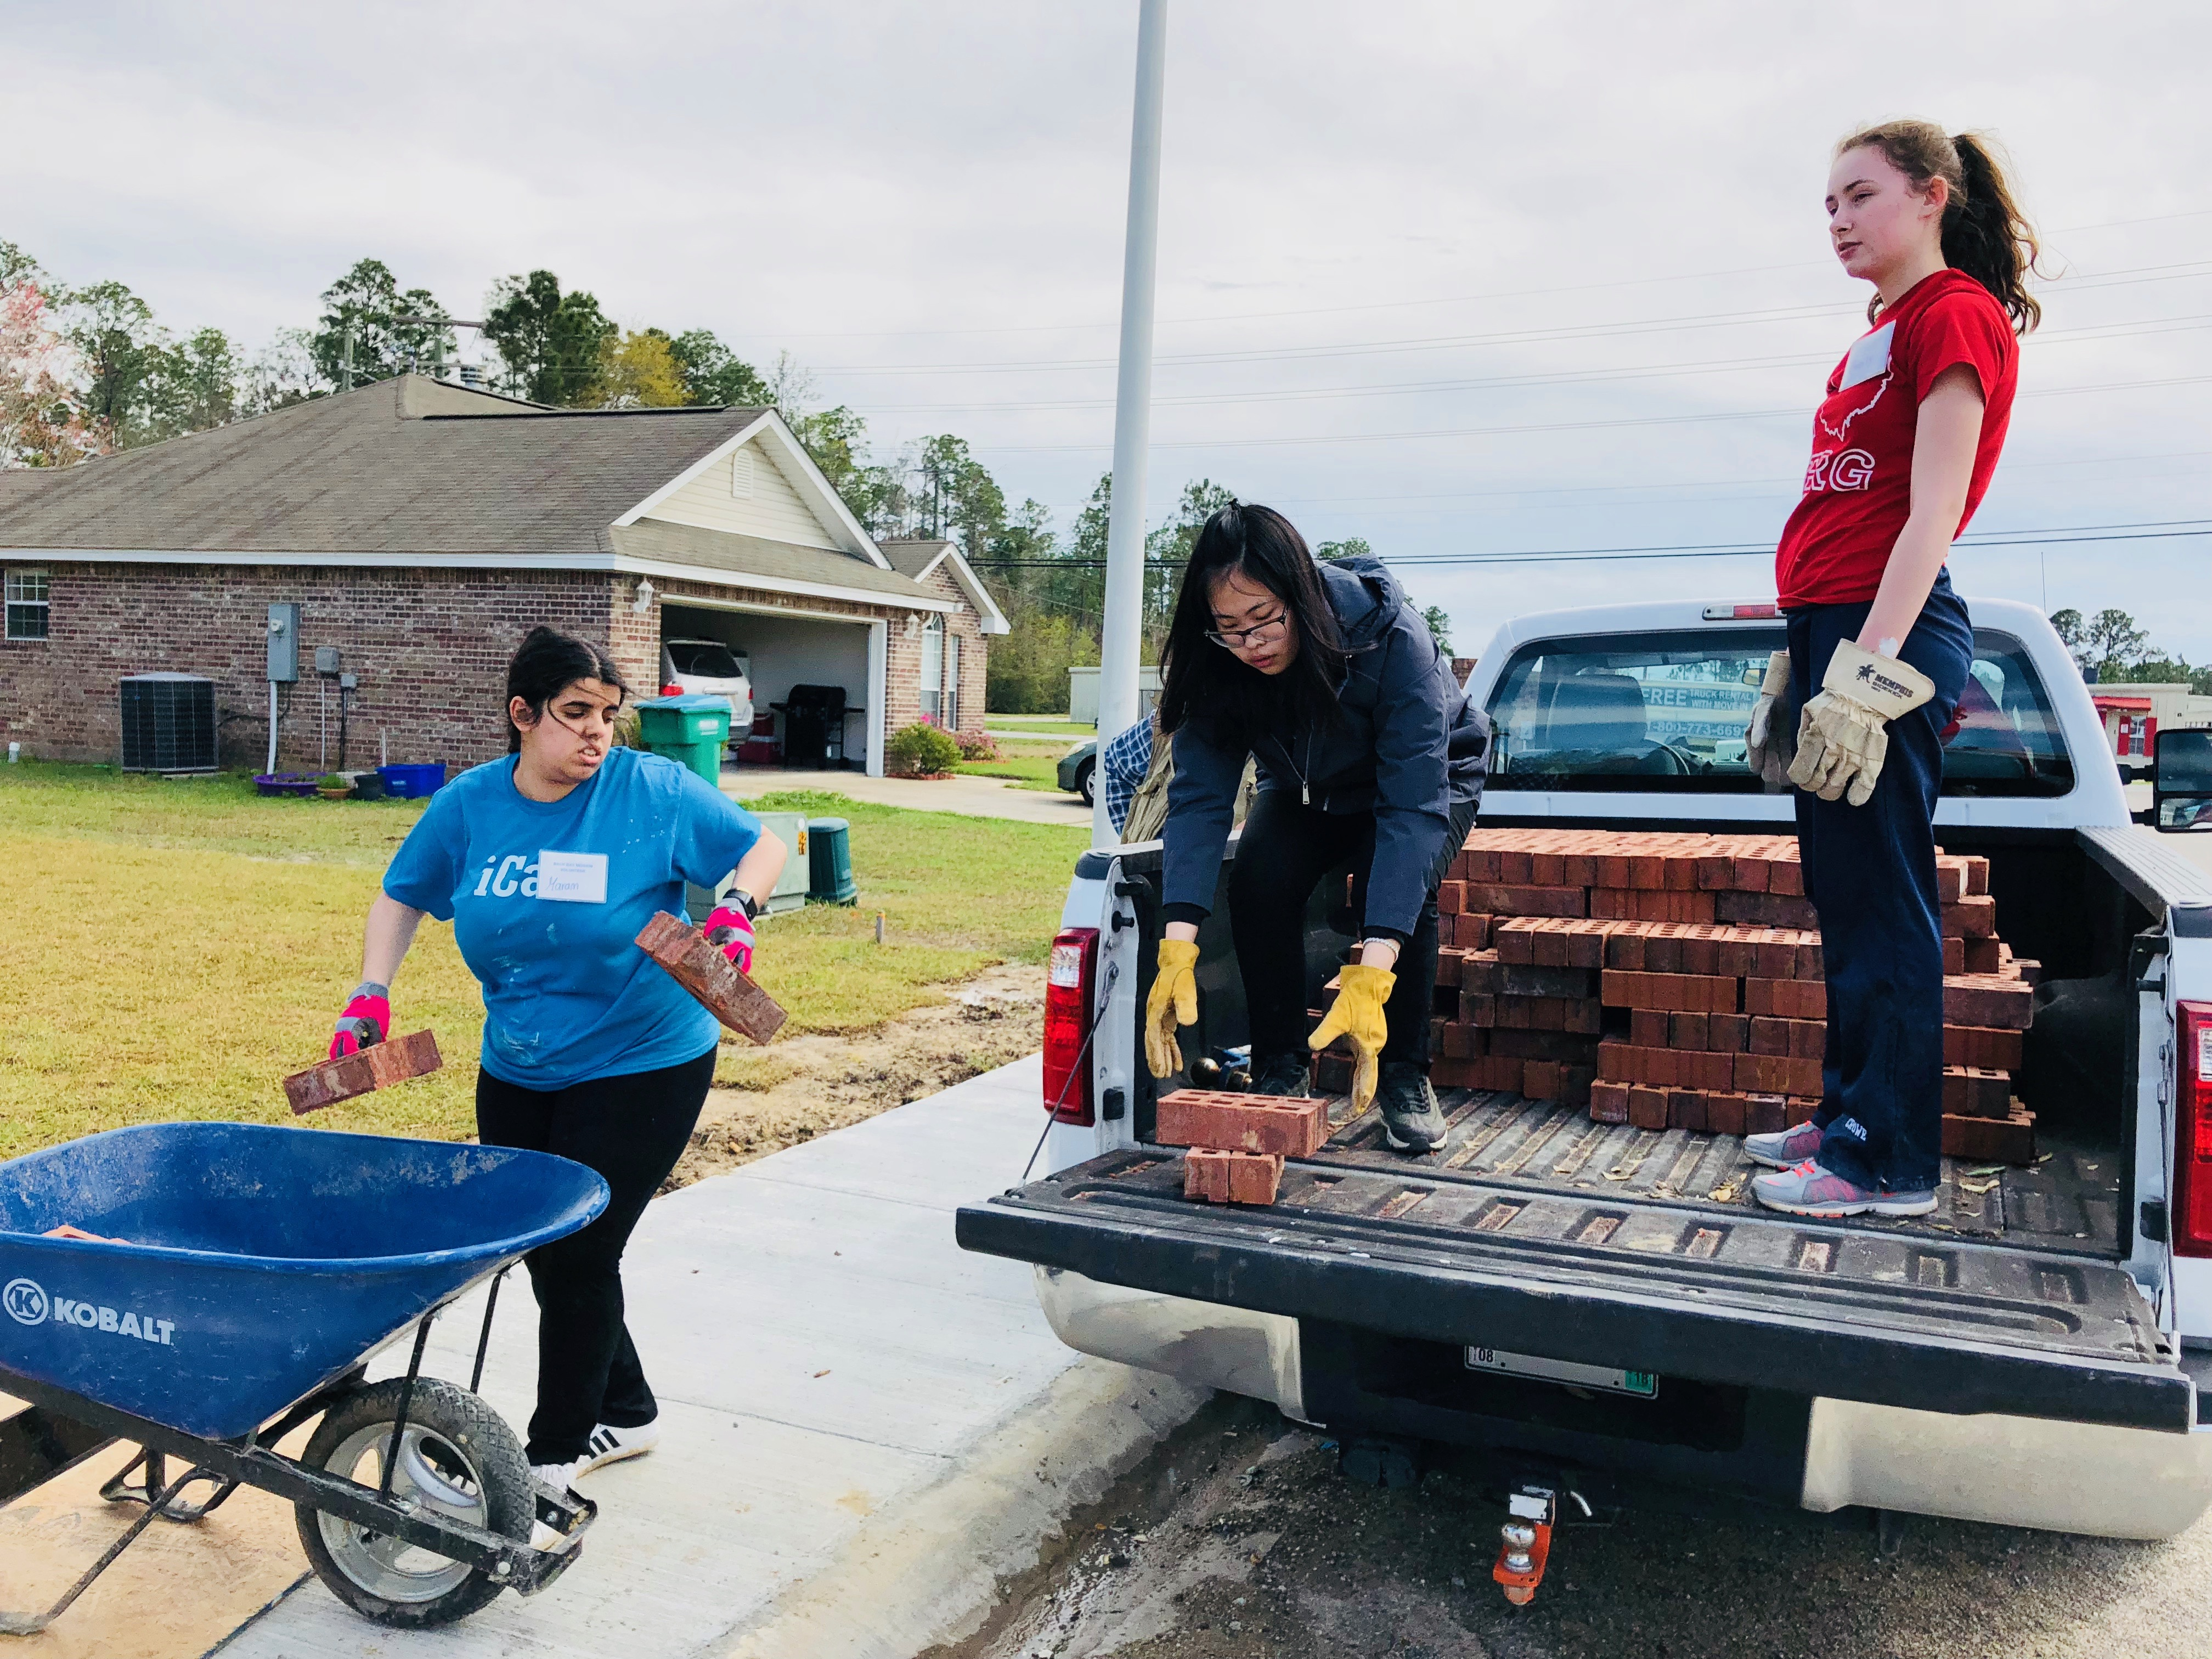 2018 Volunteer Photos: Heidelberg University (Tiffin, Ohio)